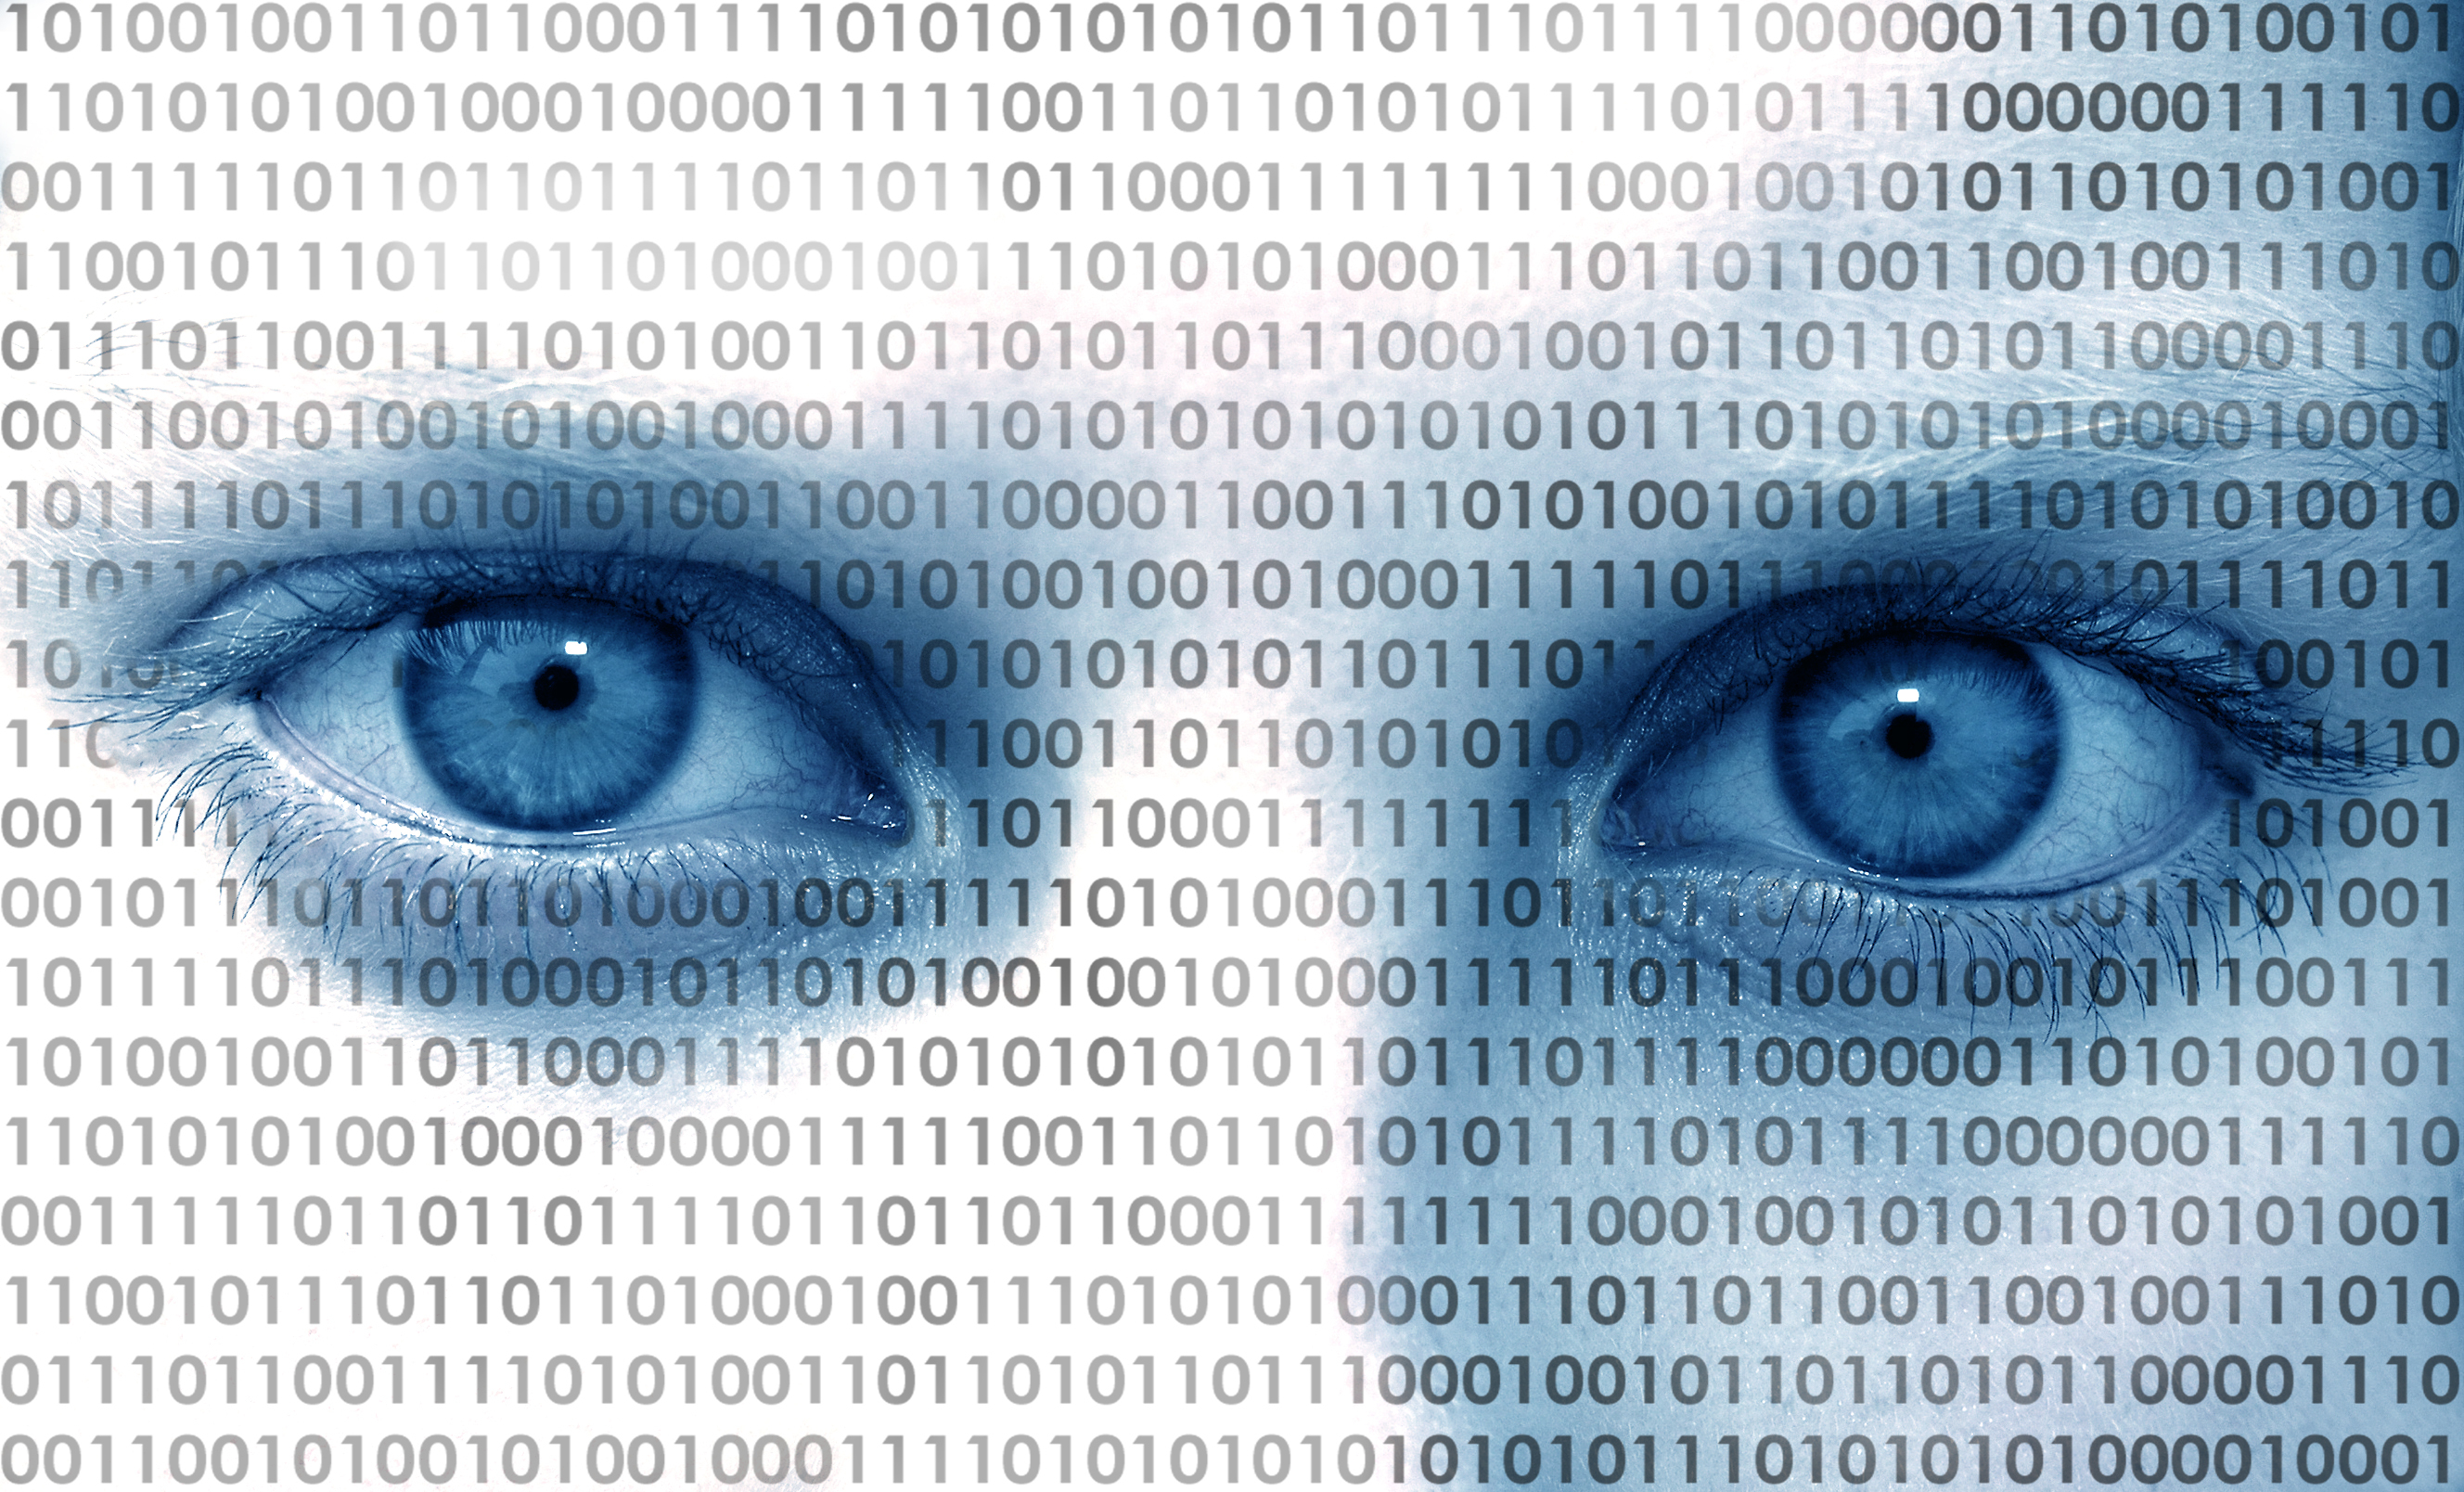 Big Data think tank